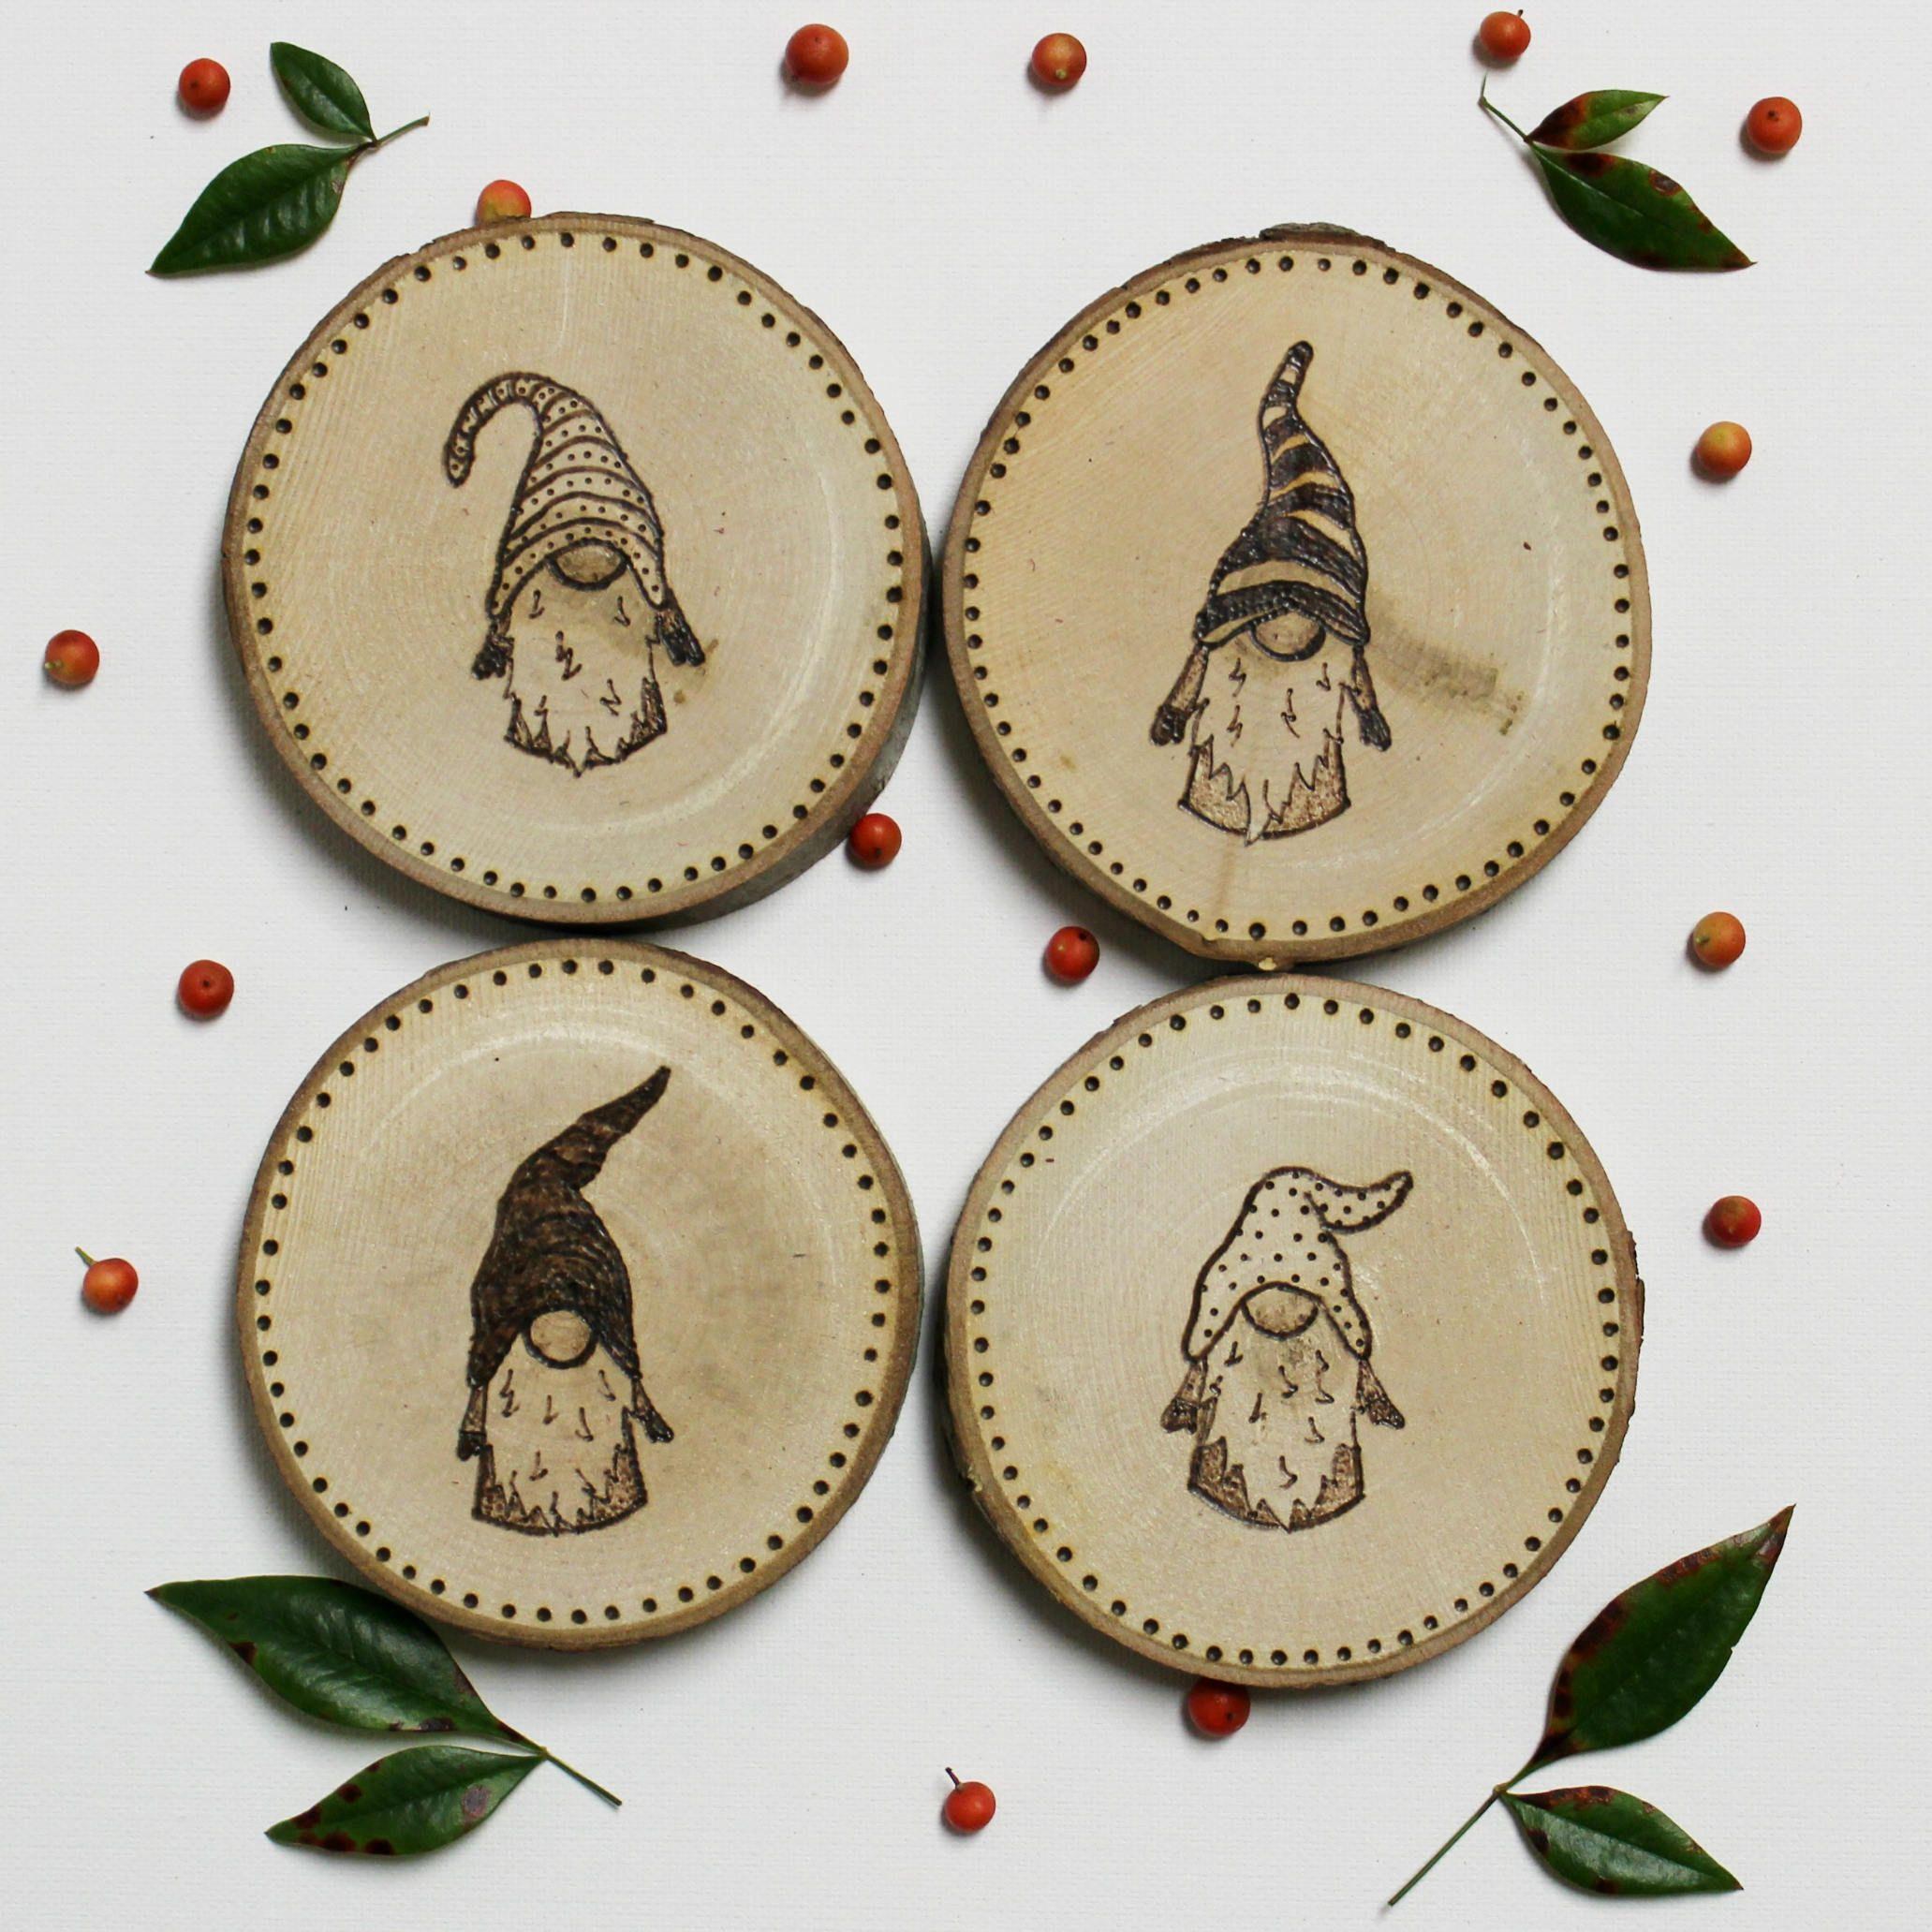 Gnome Coasters Swedish Tomte Norwegian Nisse Christmas Gnome Gnome Gift Gnomes Art Wood Burning Art Wood Christmas Ornaments Christmas Crafts